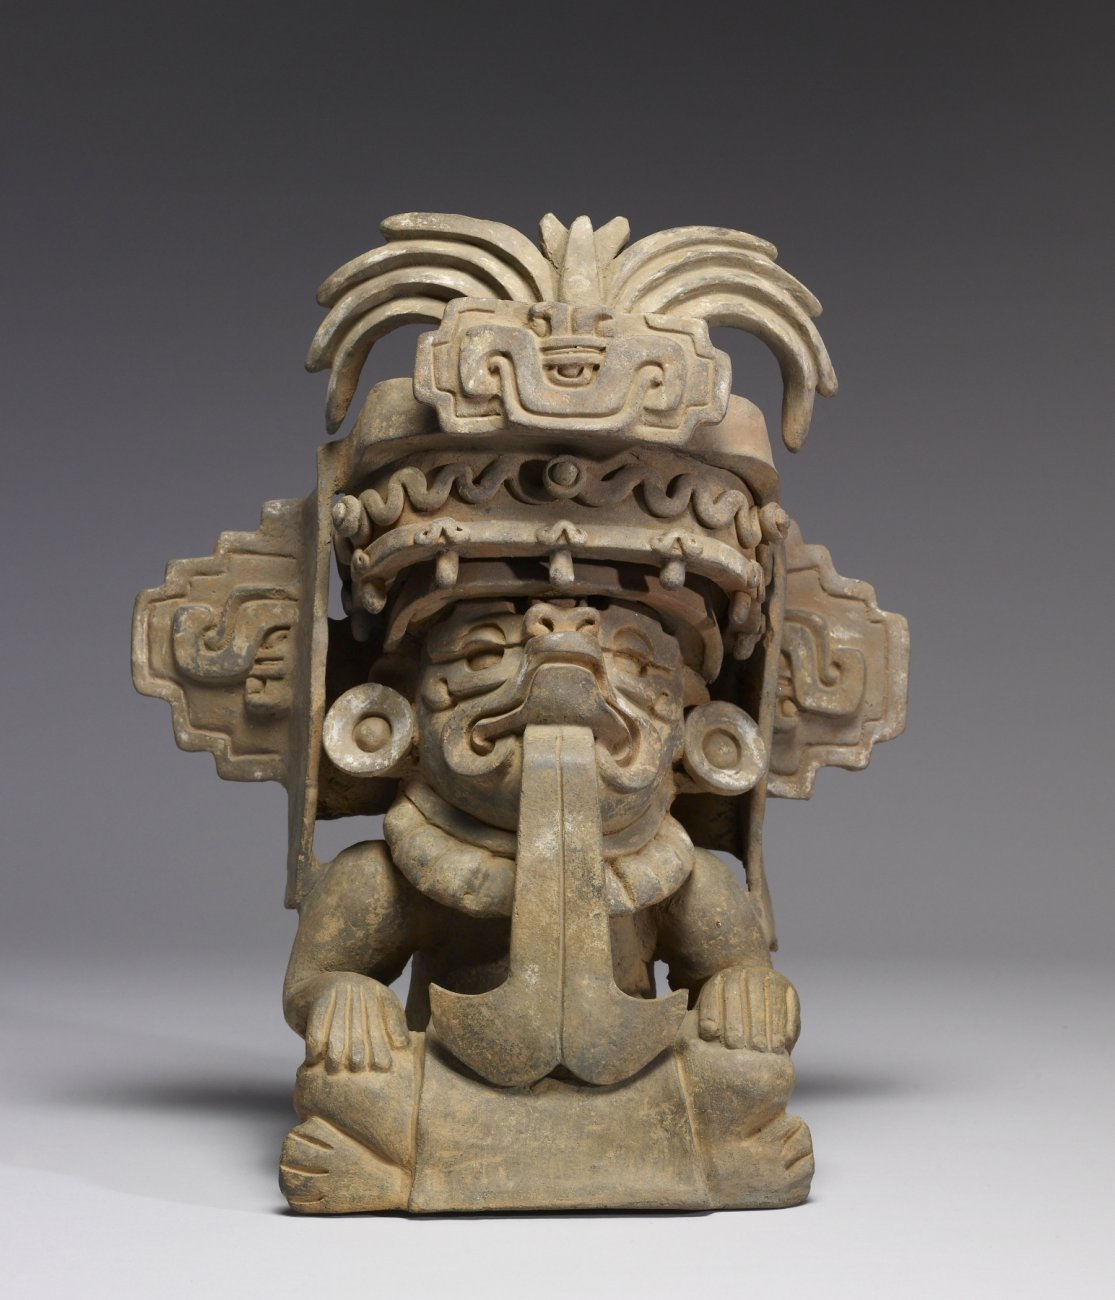 Zapotec_-_Effigy_Urn_of_Cocijo_-_Walters_482788.jpg